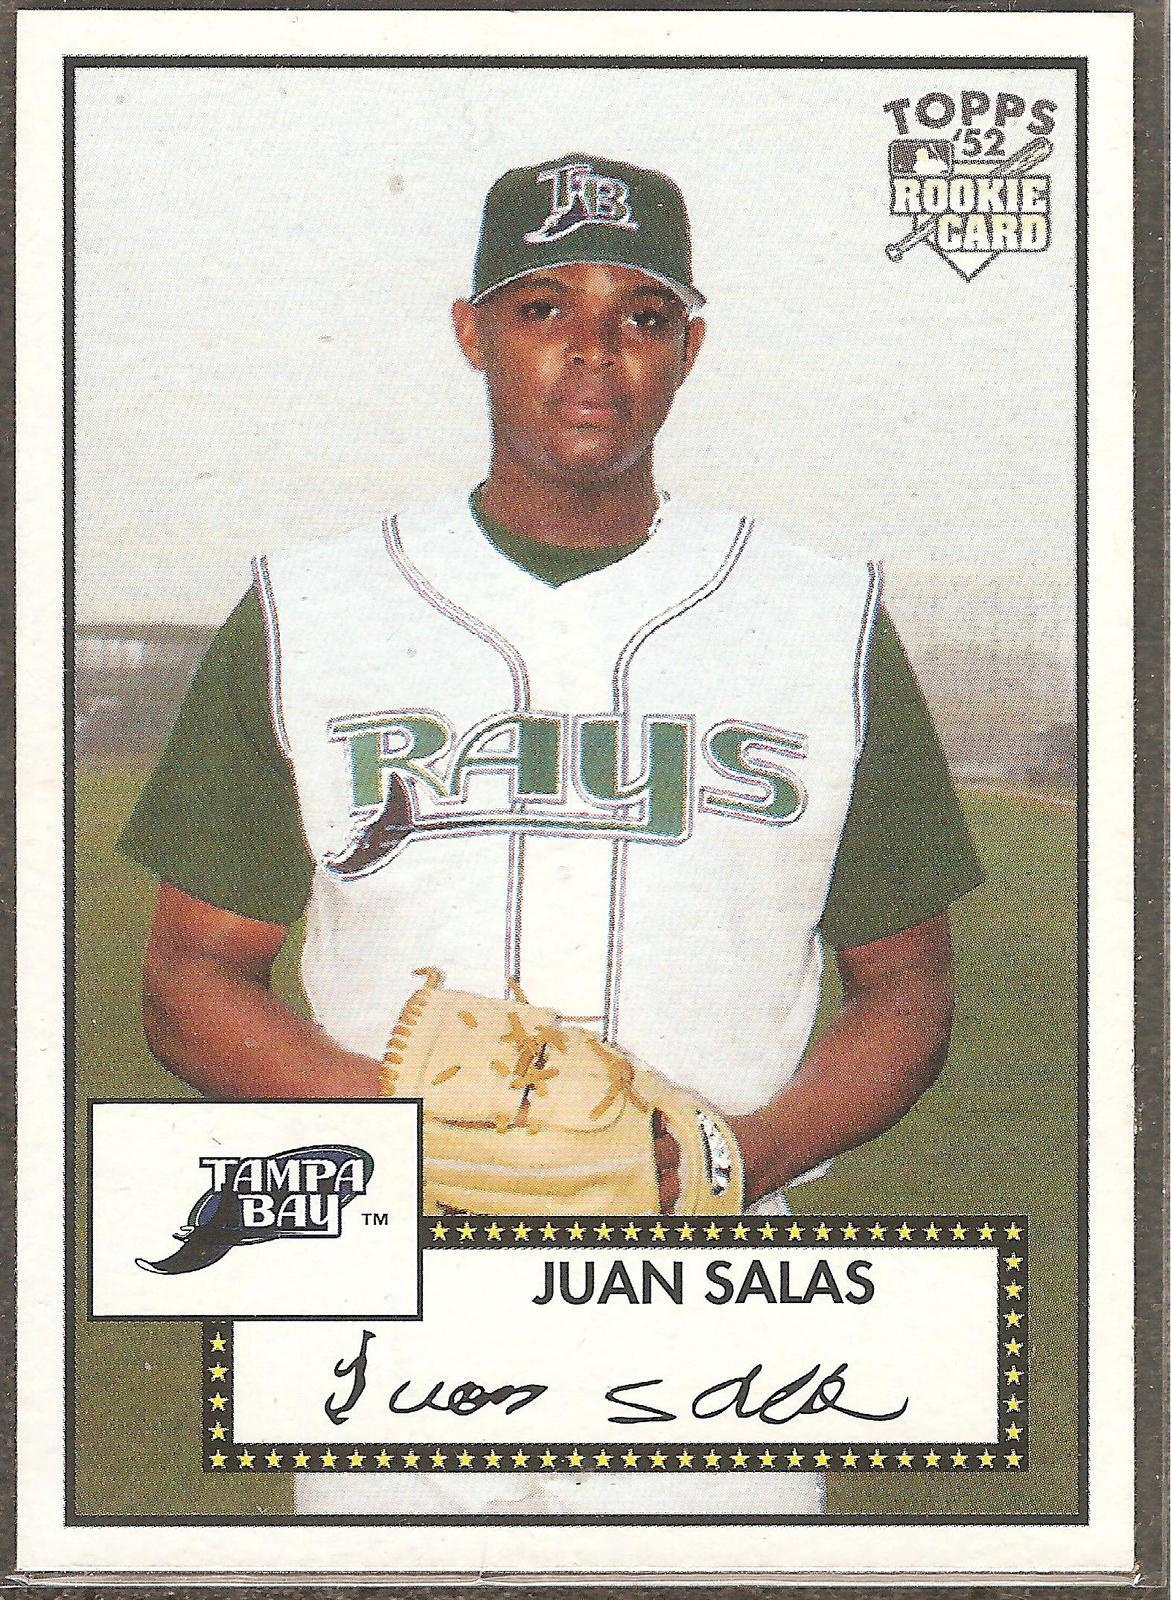 Juan Salas Topps '52 2007 #114 Rookie Card Tampa Bay Devil Rays - $0.20